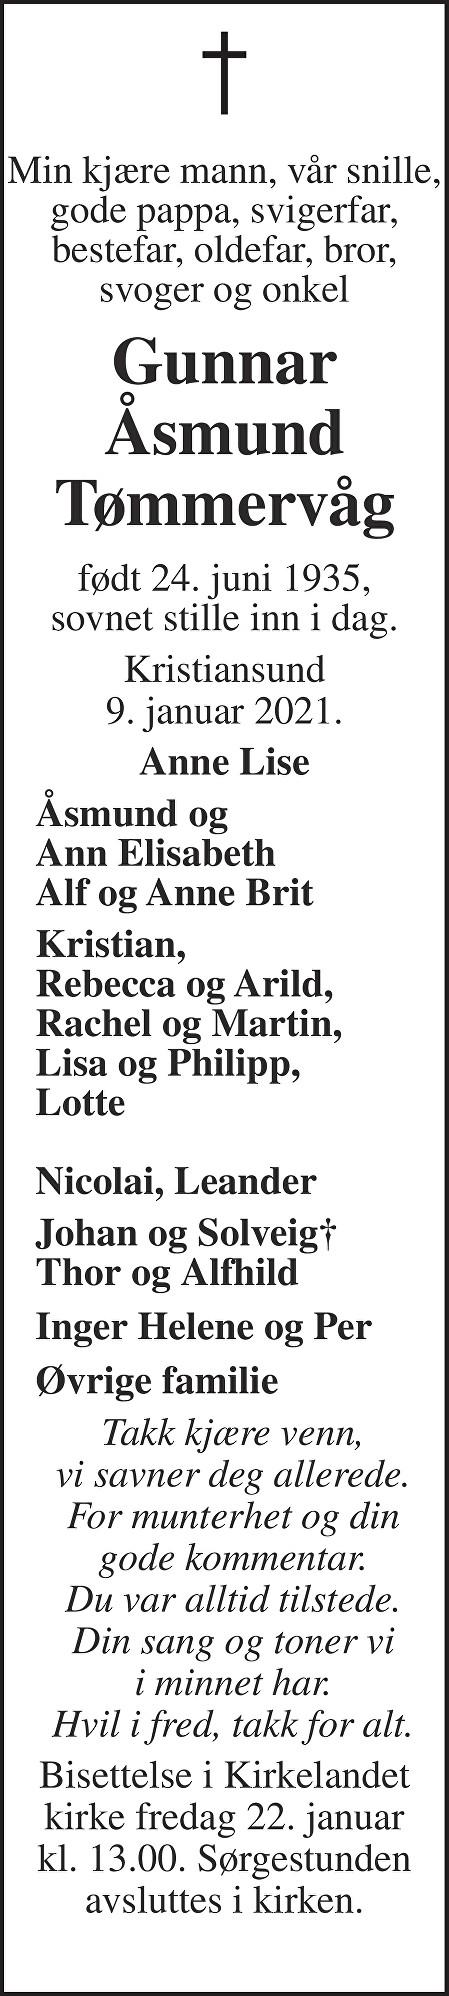 Gunnar Åsmund Tømmervåg Dødsannonse